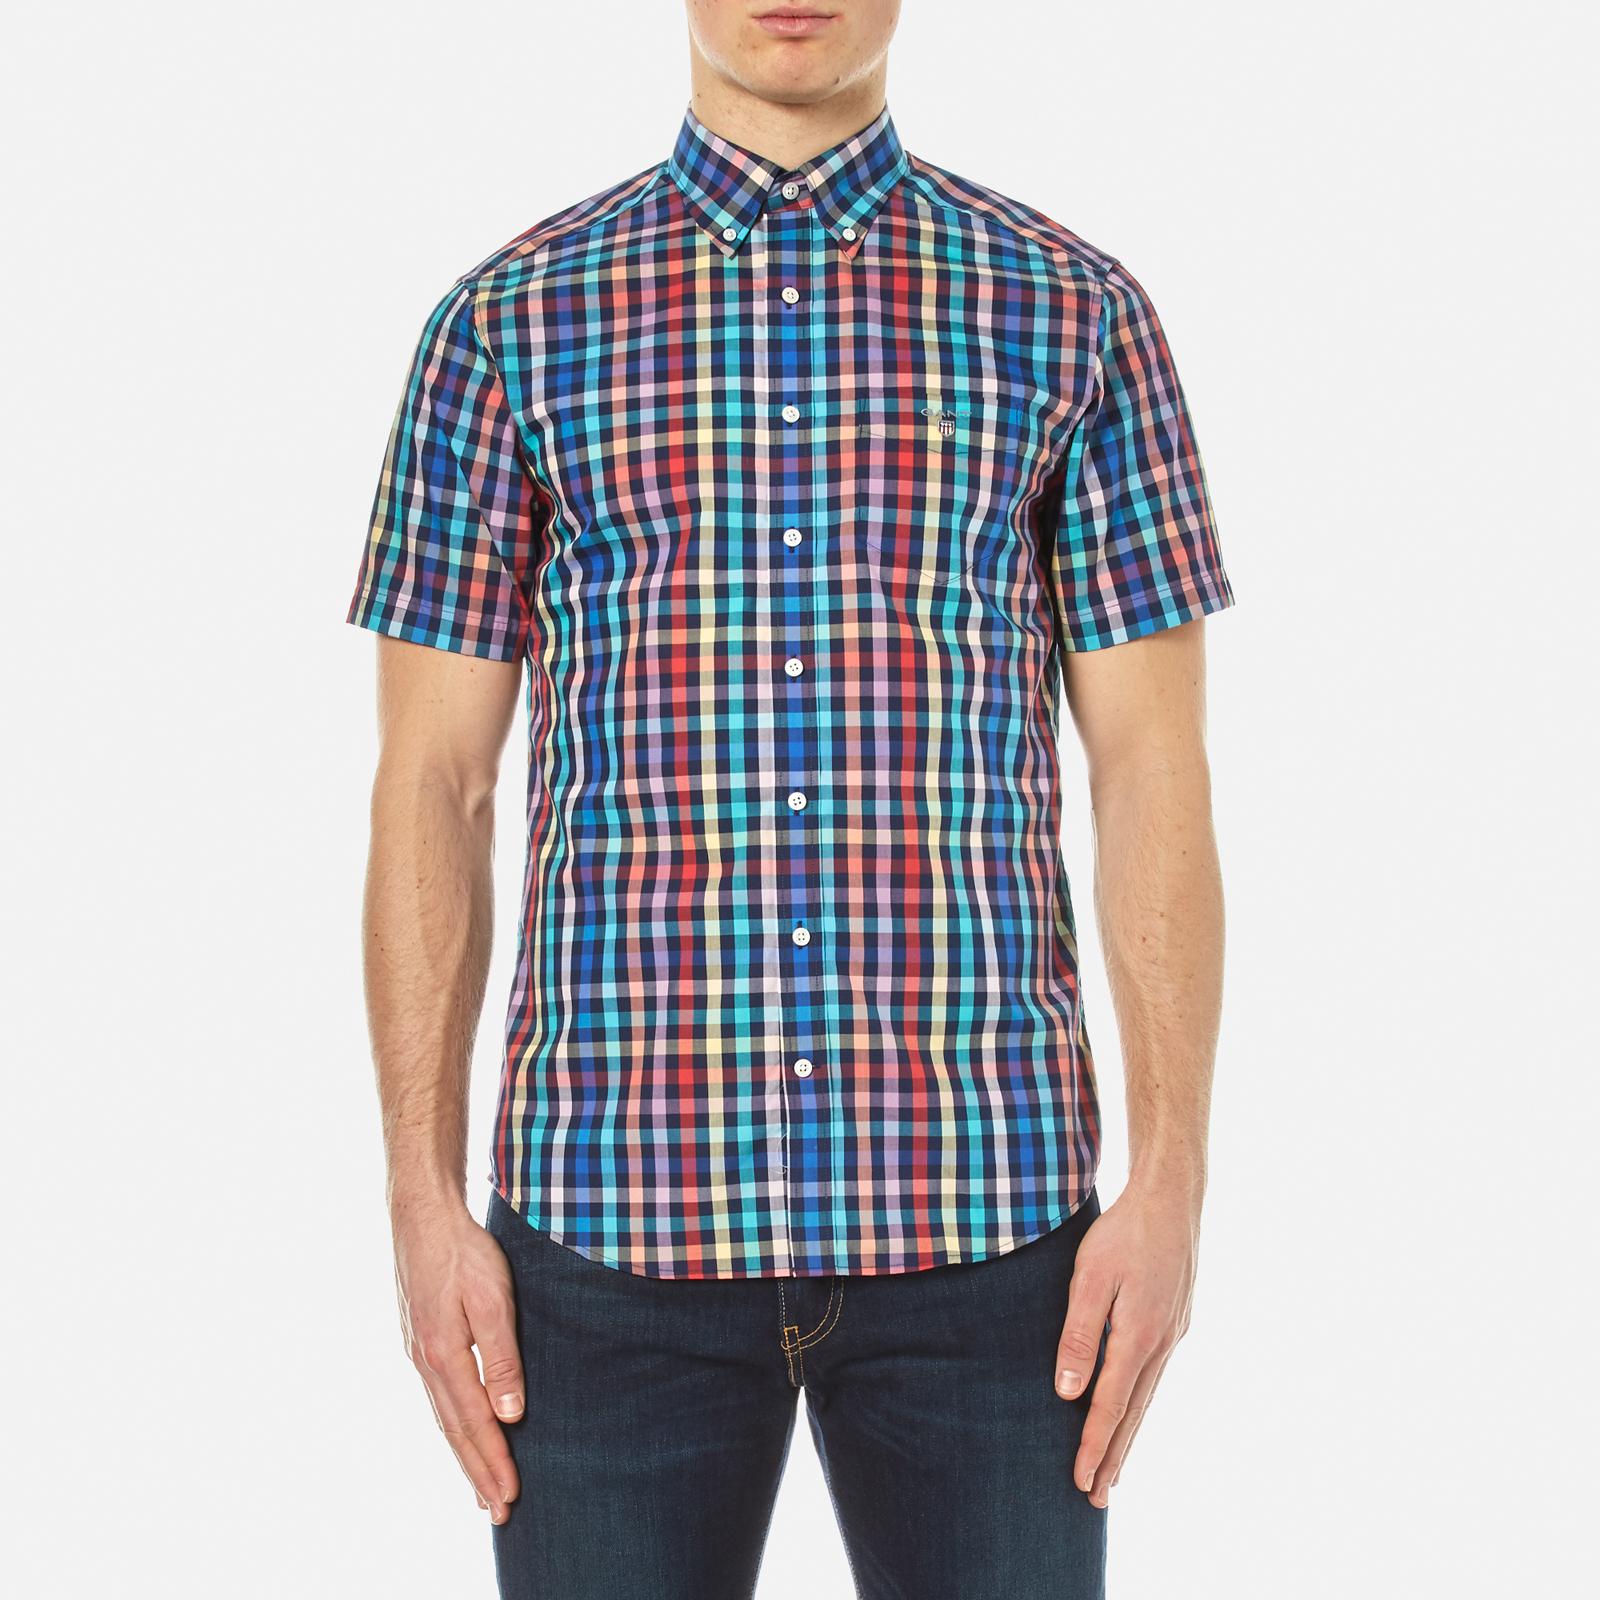 70400582c0f GANT Men's Small Check Short Sleeve Shirt - Persian Blue Mens Clothing    TheHut.com